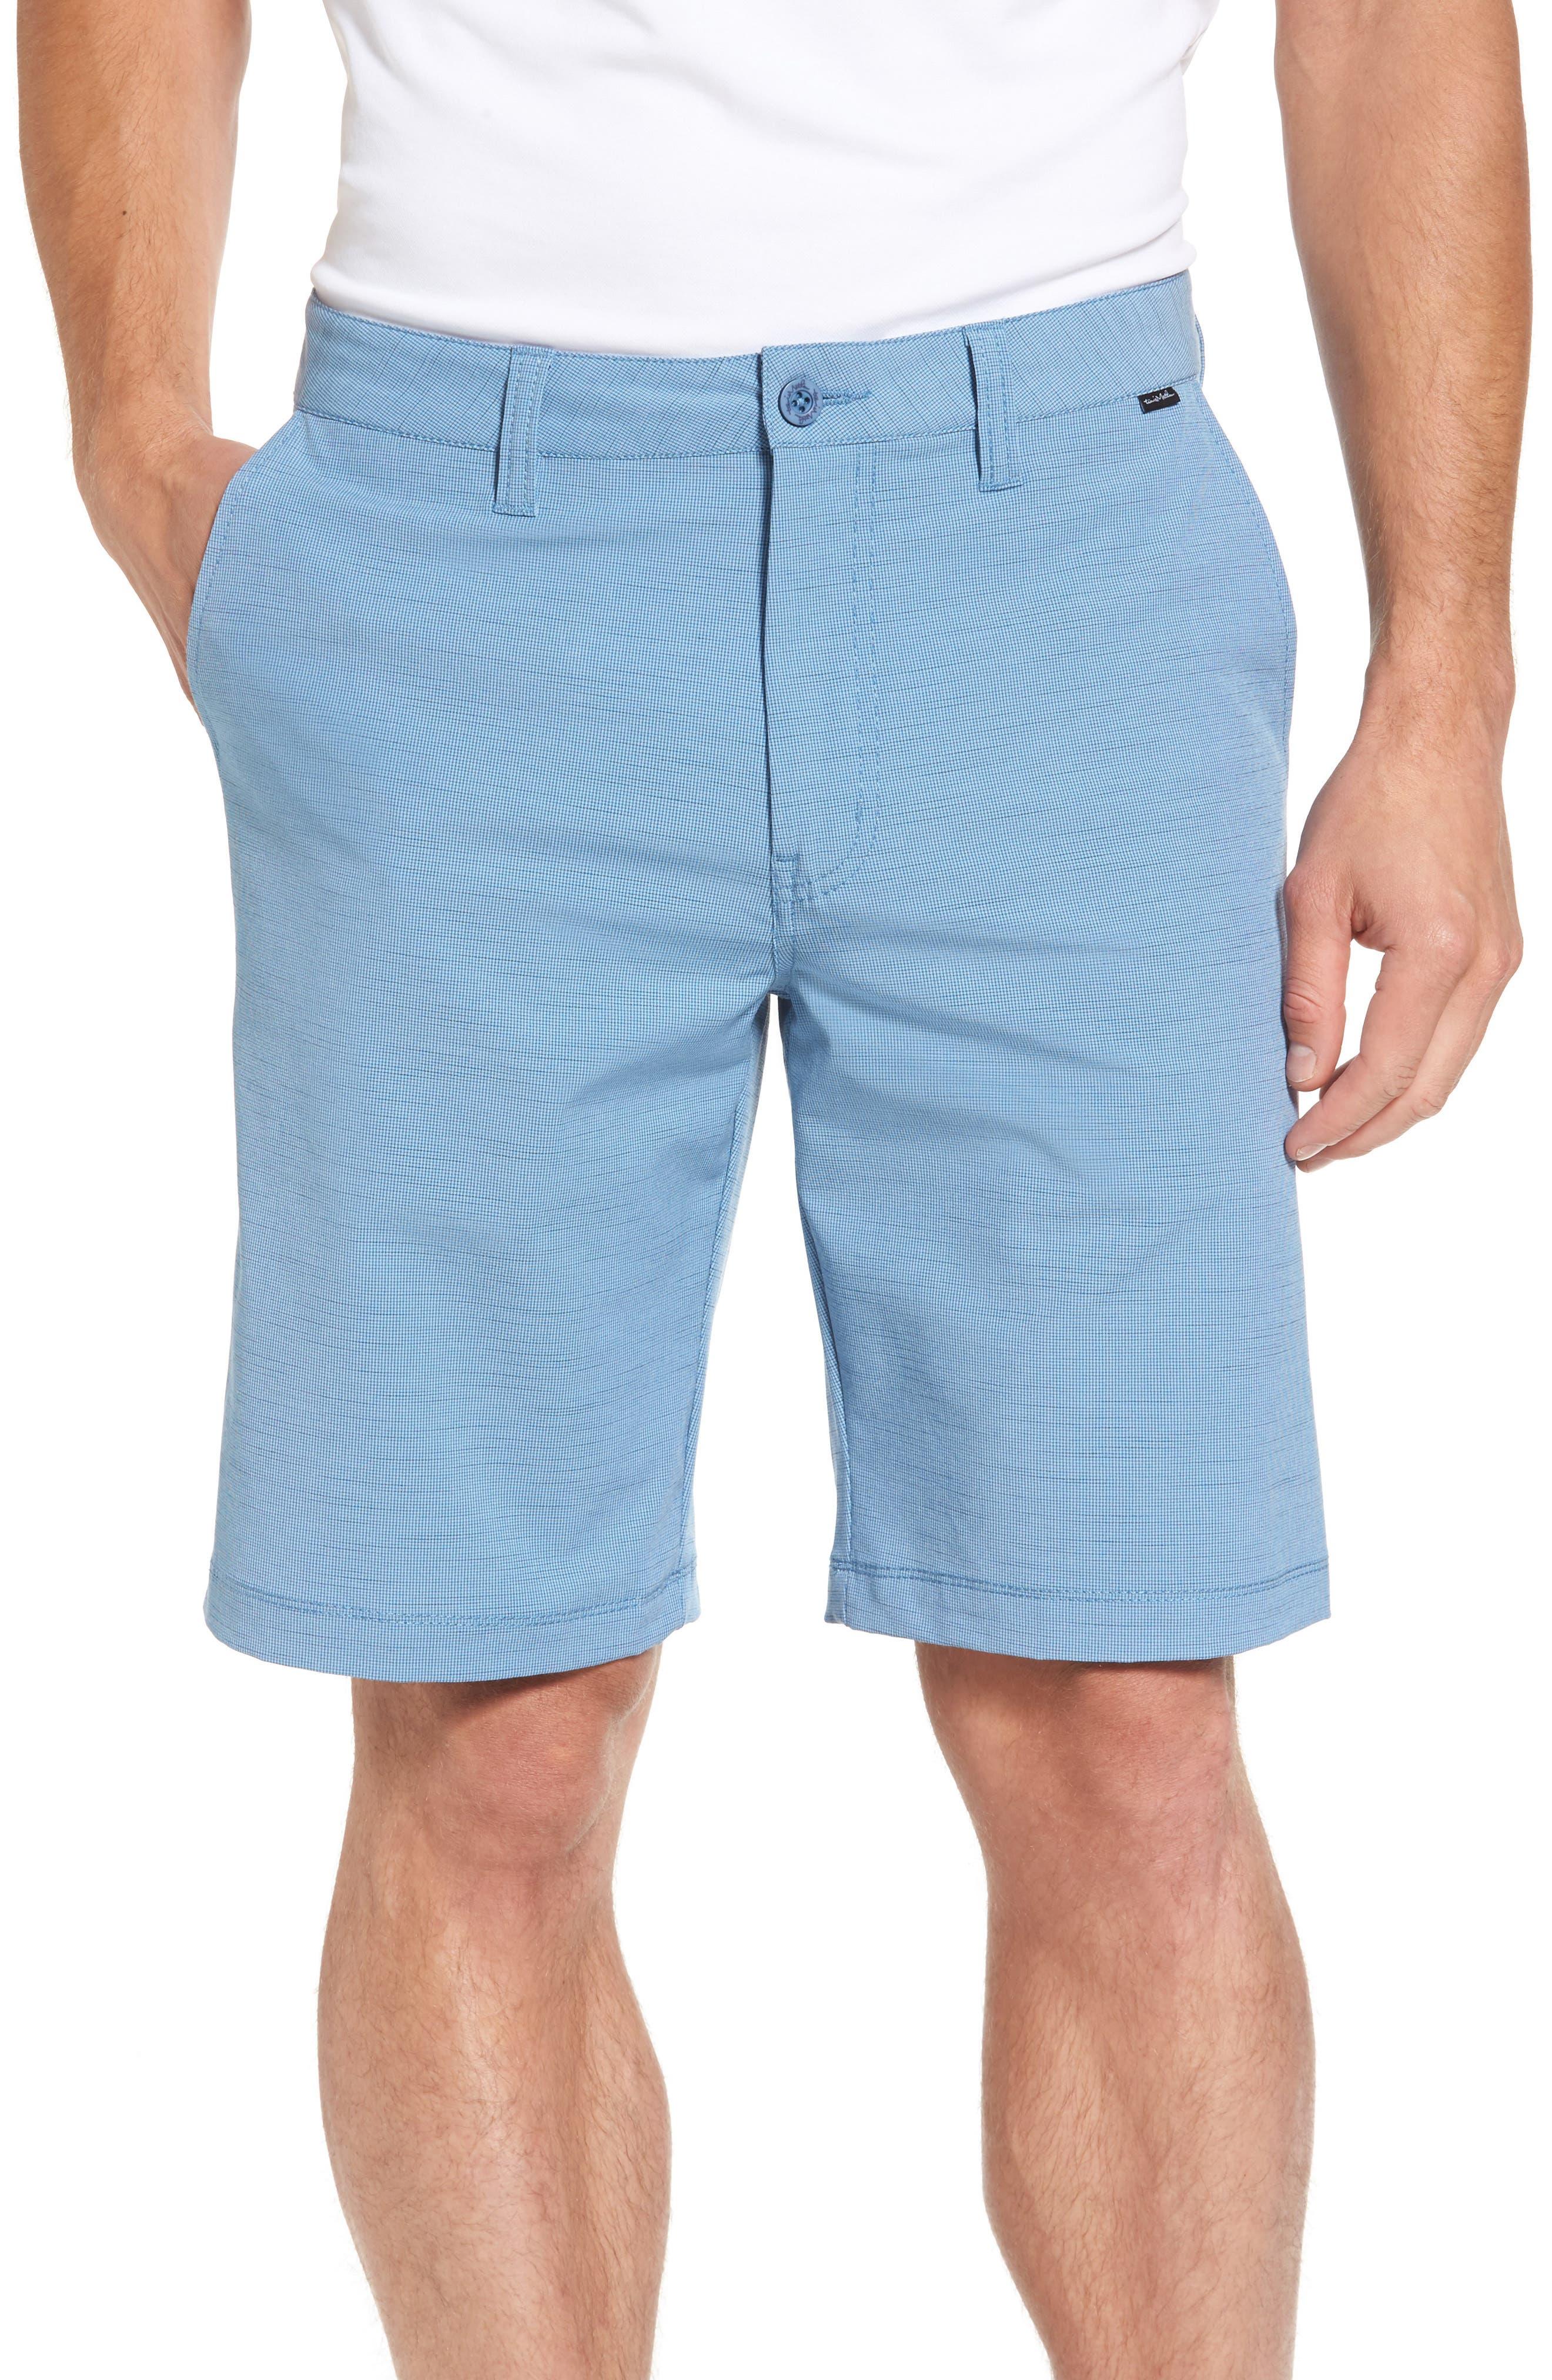 Fisher Shorts,                         Main,                         color, Dusk Blue